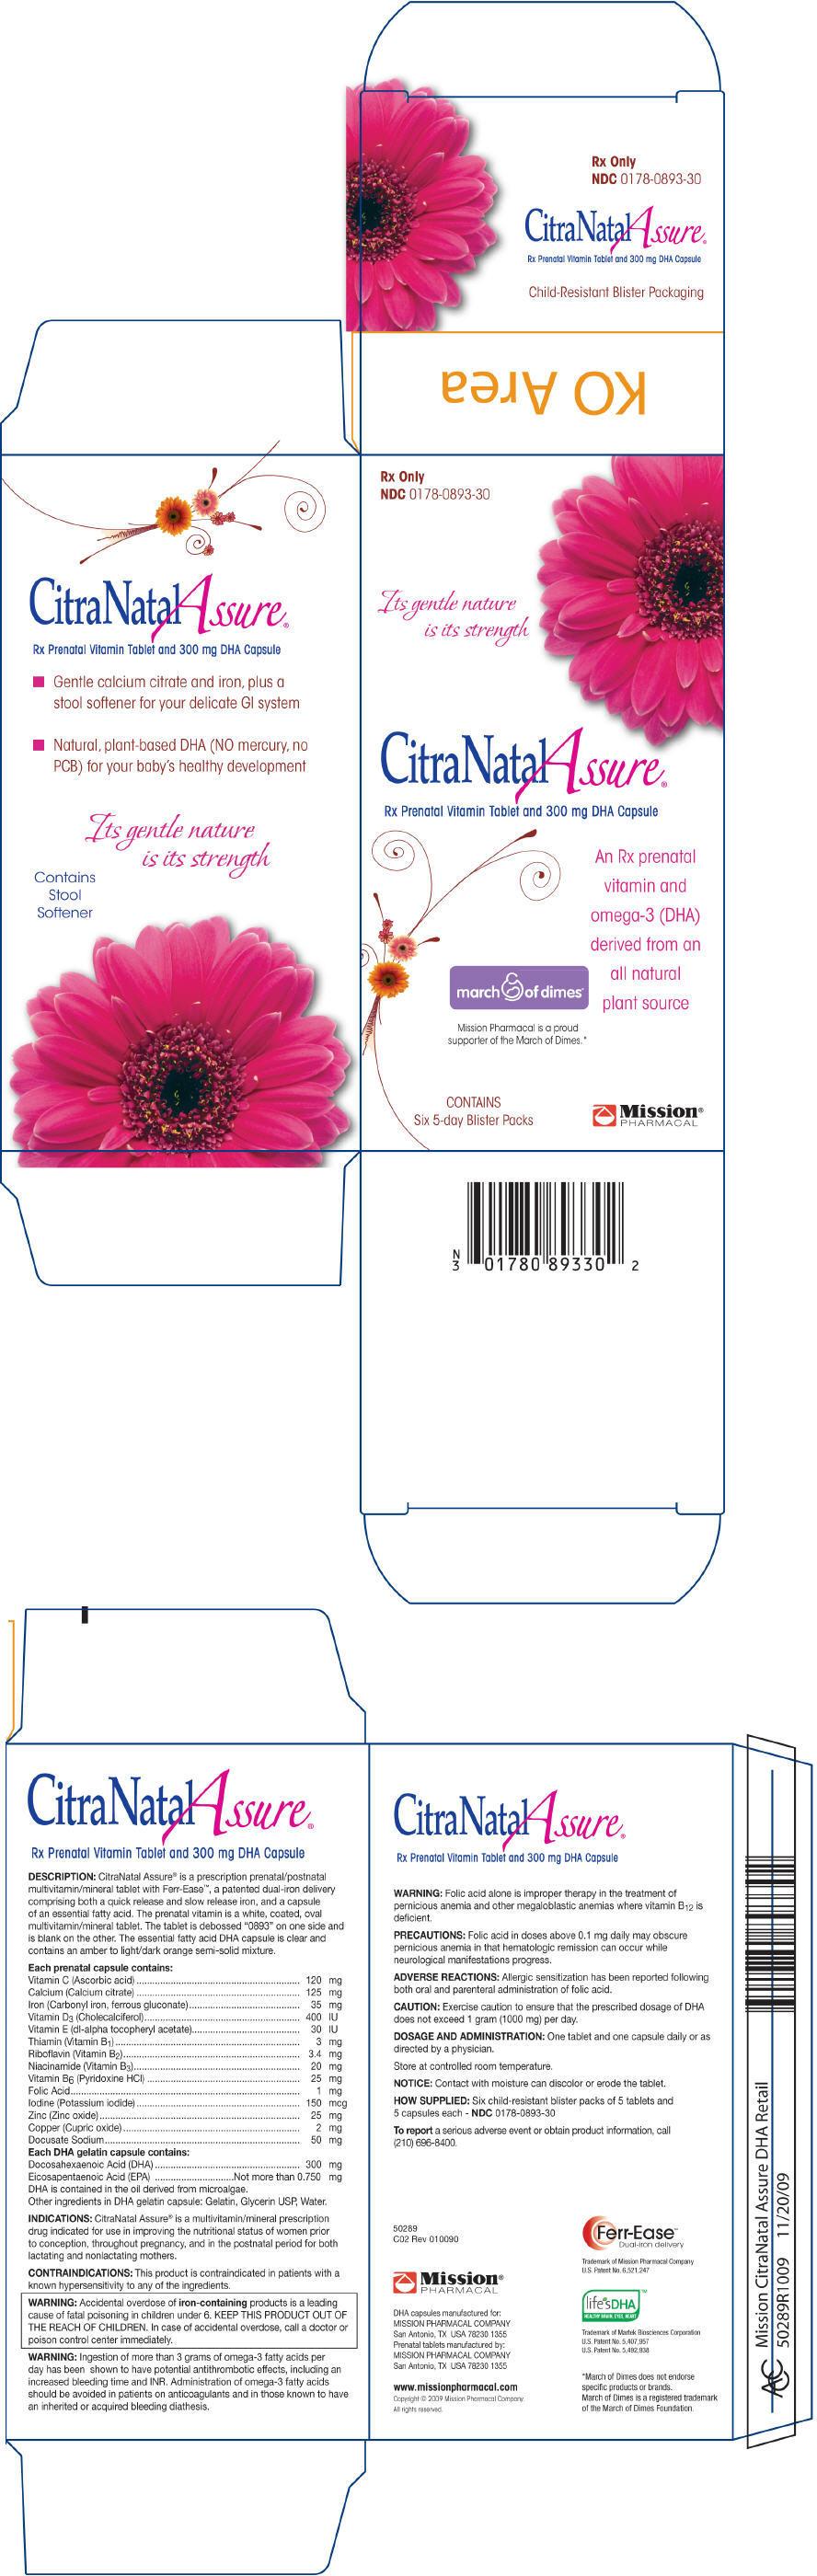 Citranatal Assure (Ascorbic Acid, Calcium Citrate, Iron, Vitamin D, .alpha.-tocopherol Acetate, Dl-, Thiamine, Riboflavin, Niacinamide, Pyridoxine Hydrochloride, Folic Acid, Iodine, Zinc, Copper, Docusate Sodium, Doconexent And Icosapent) Kit [Mission Pharmacal Company]